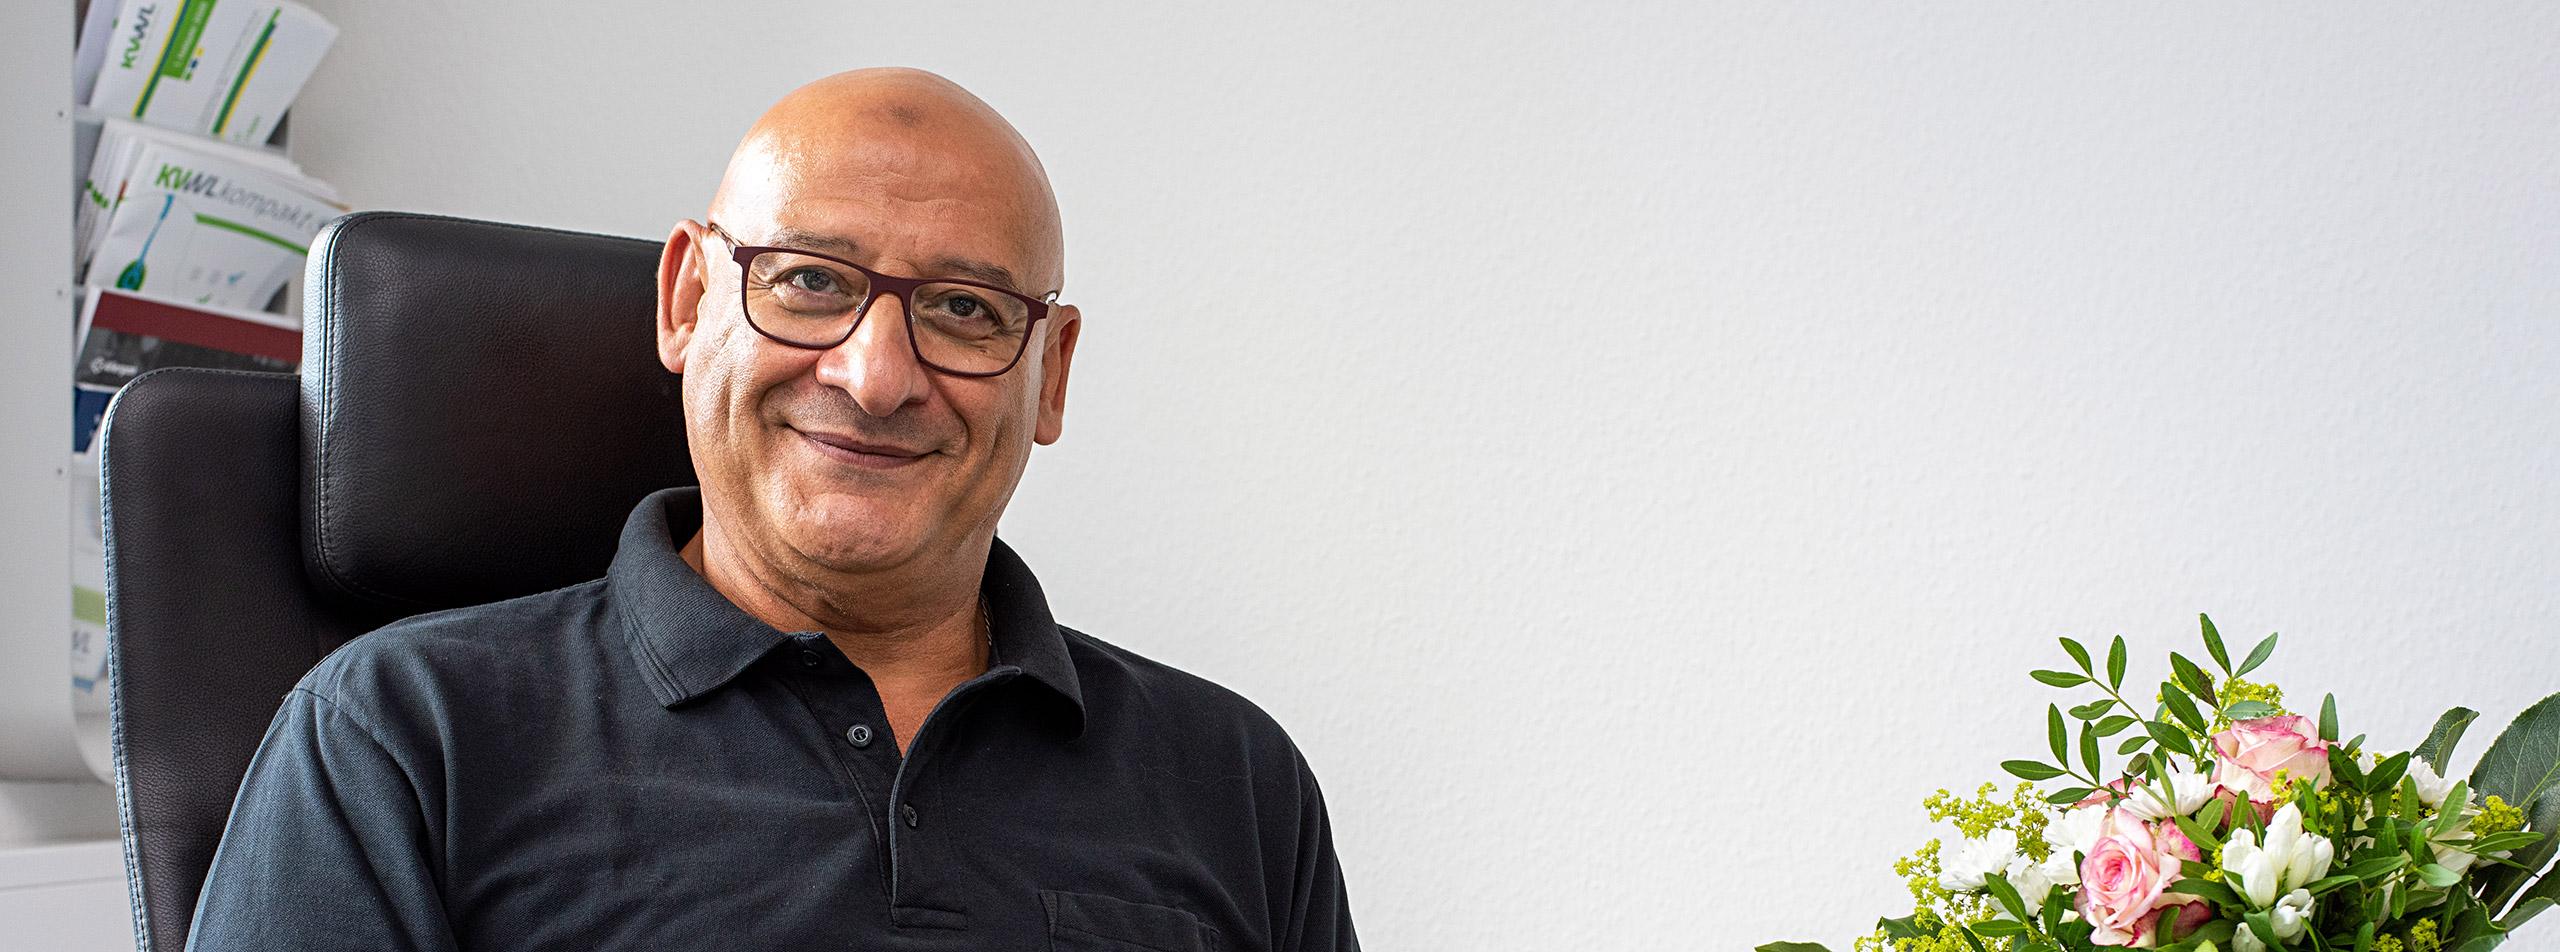 heleis header - Facharzt Wali Heleis